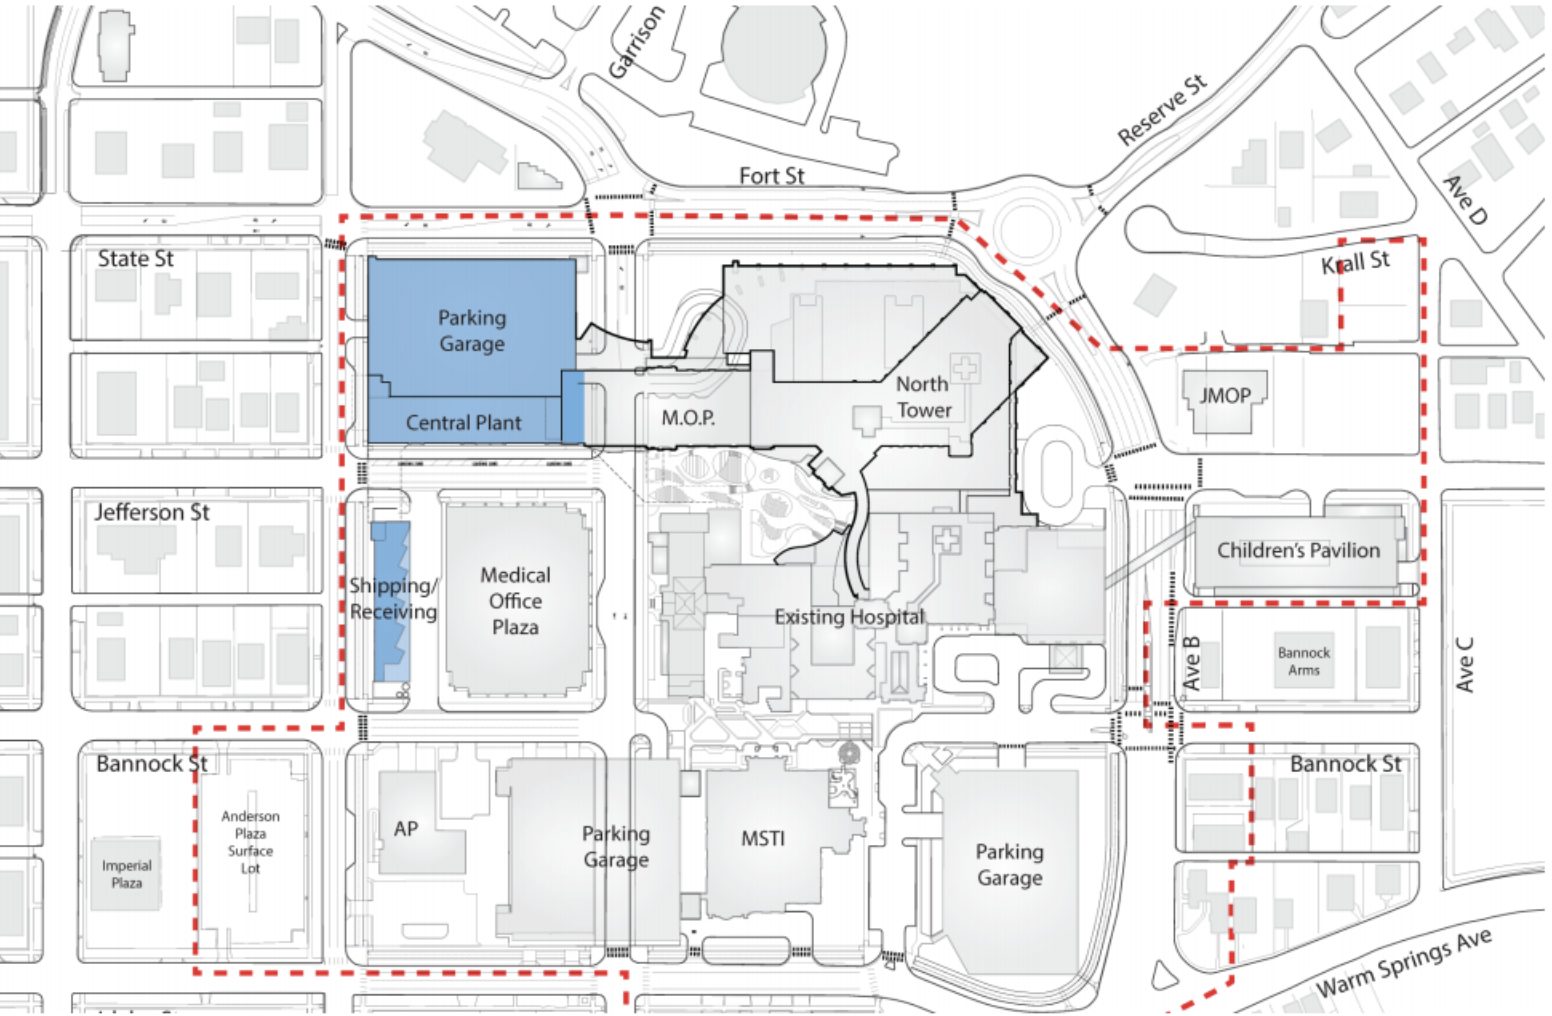 Site plan. New buildings in blue. Courtesy St. Luke's Health System.